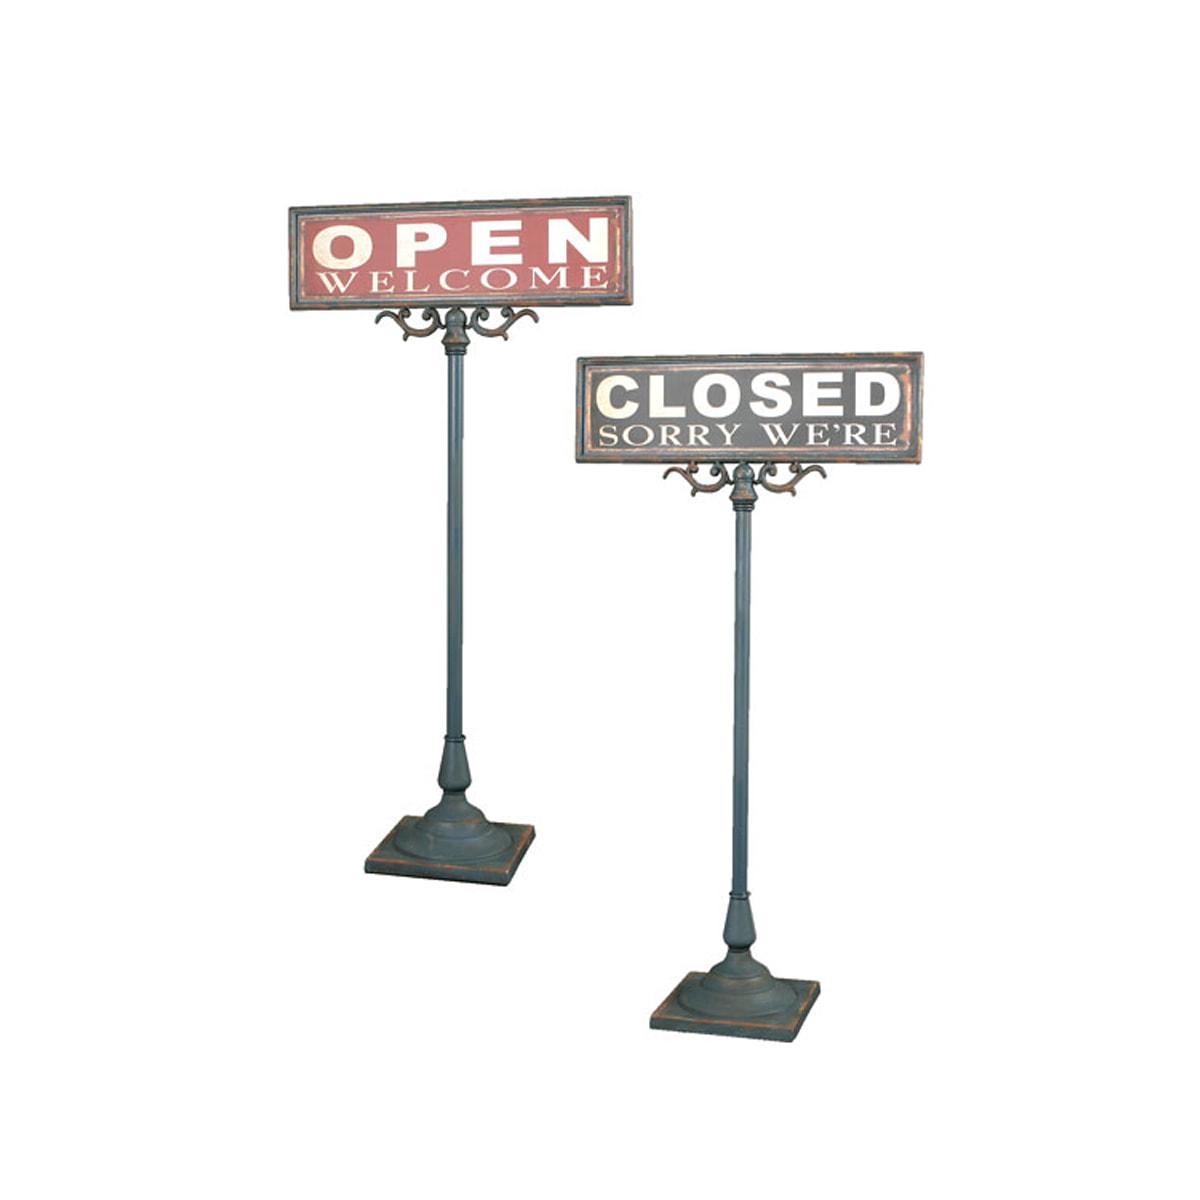 オープンクローズド